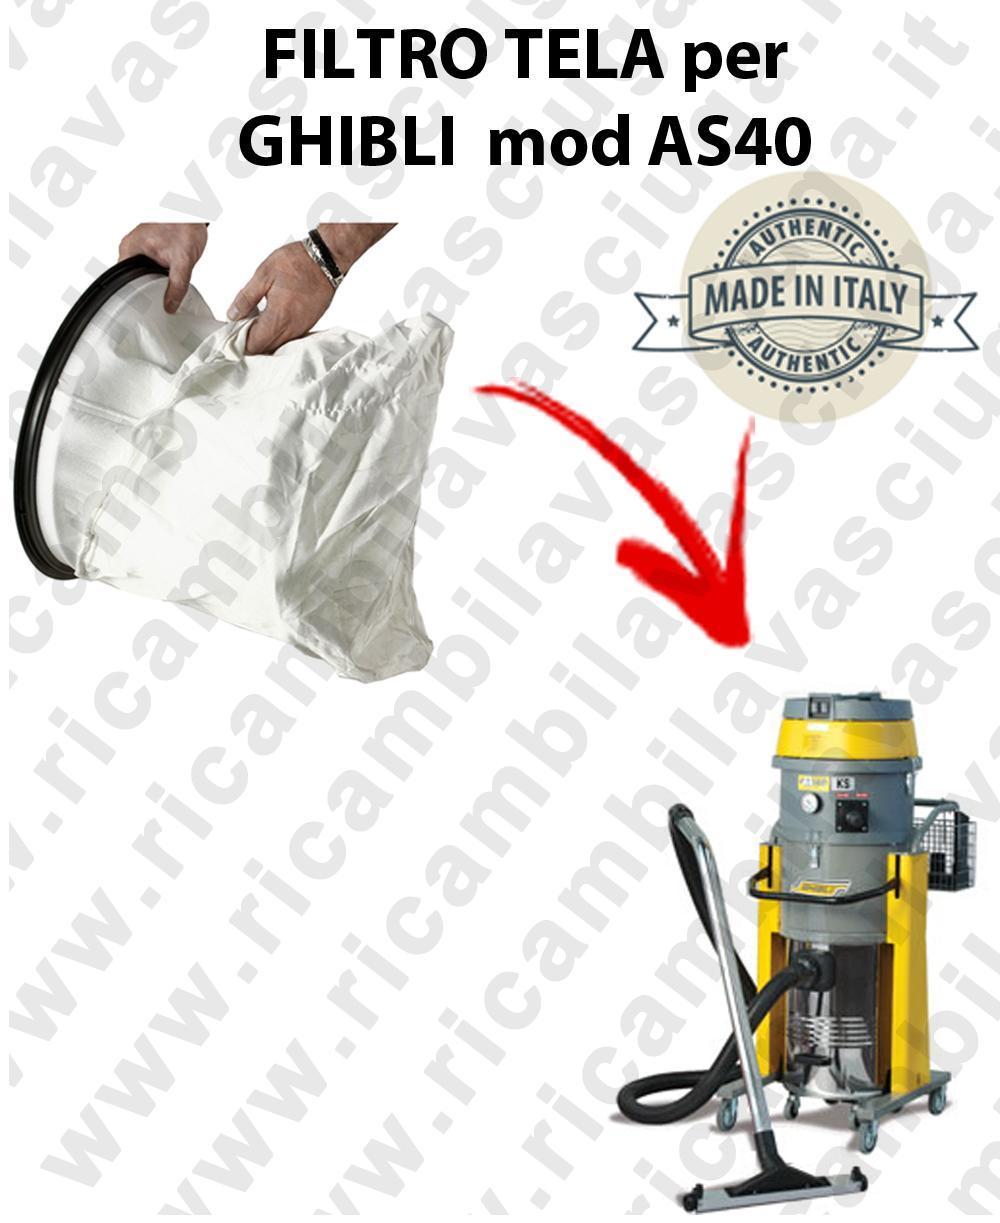 NYLON filter bag cod: 3001220 for vacuum cleaner GHIBLI model AS40